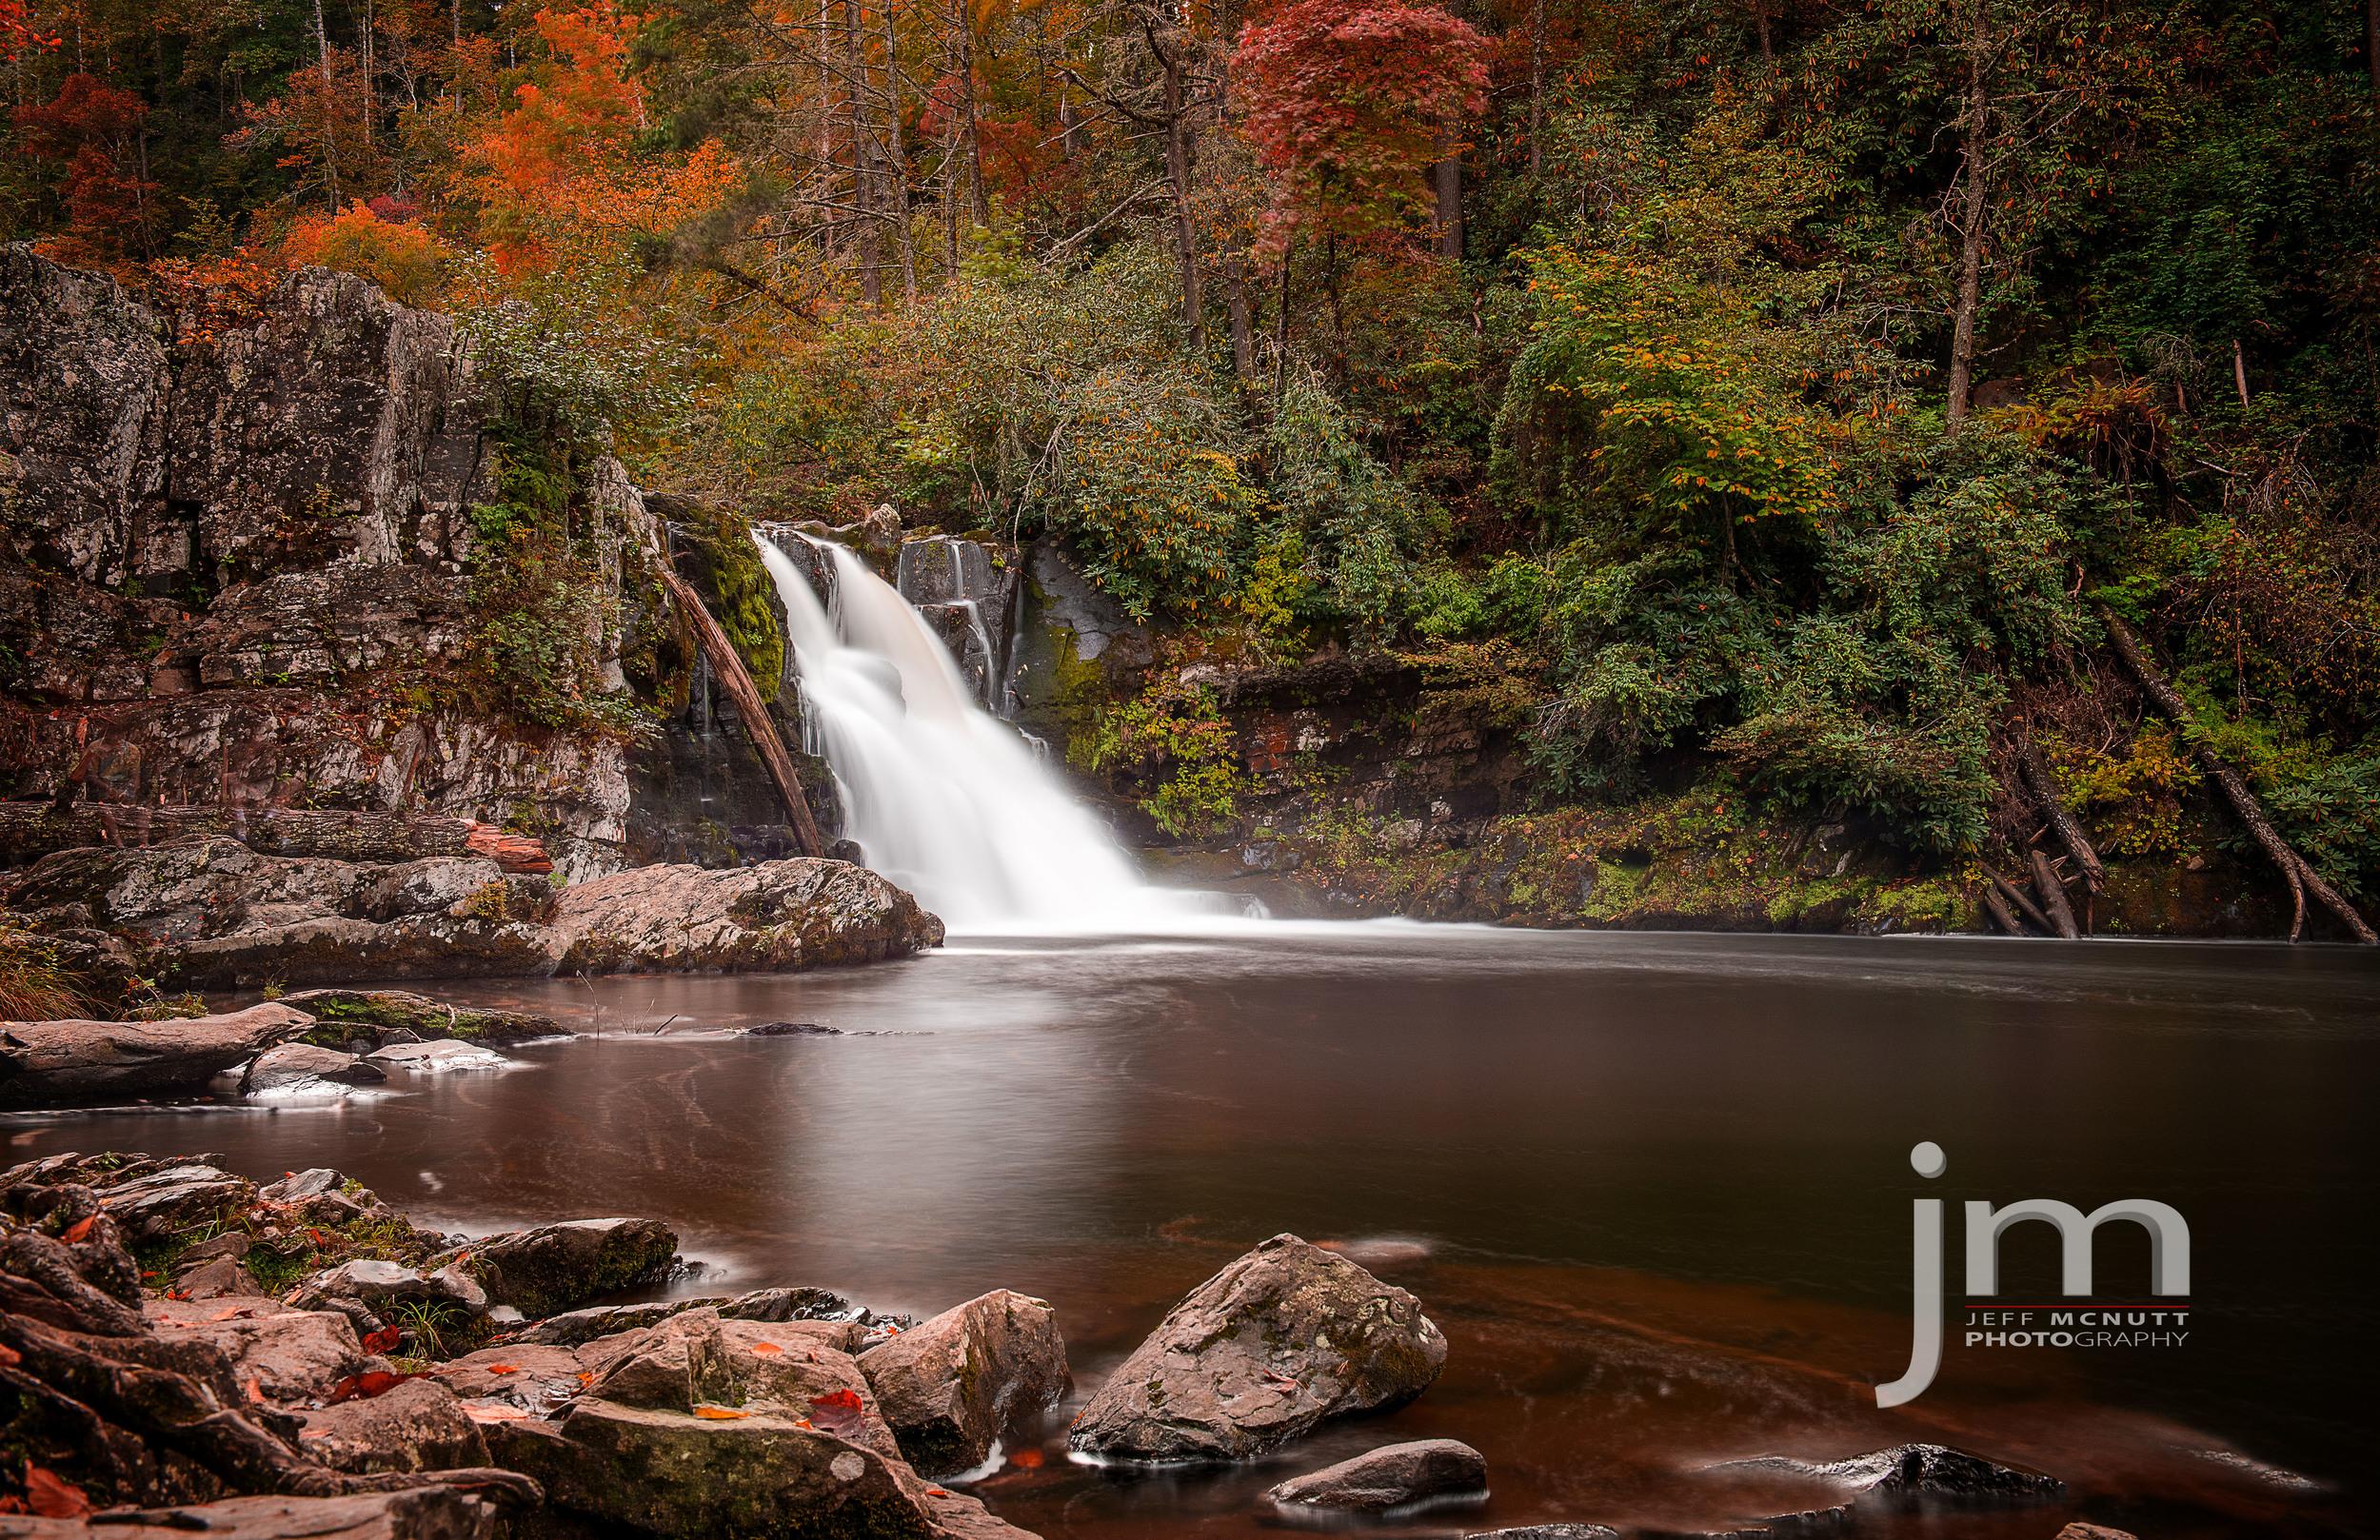 Abram's Falls, Cades Cove, Great Smoky Mountains National Park